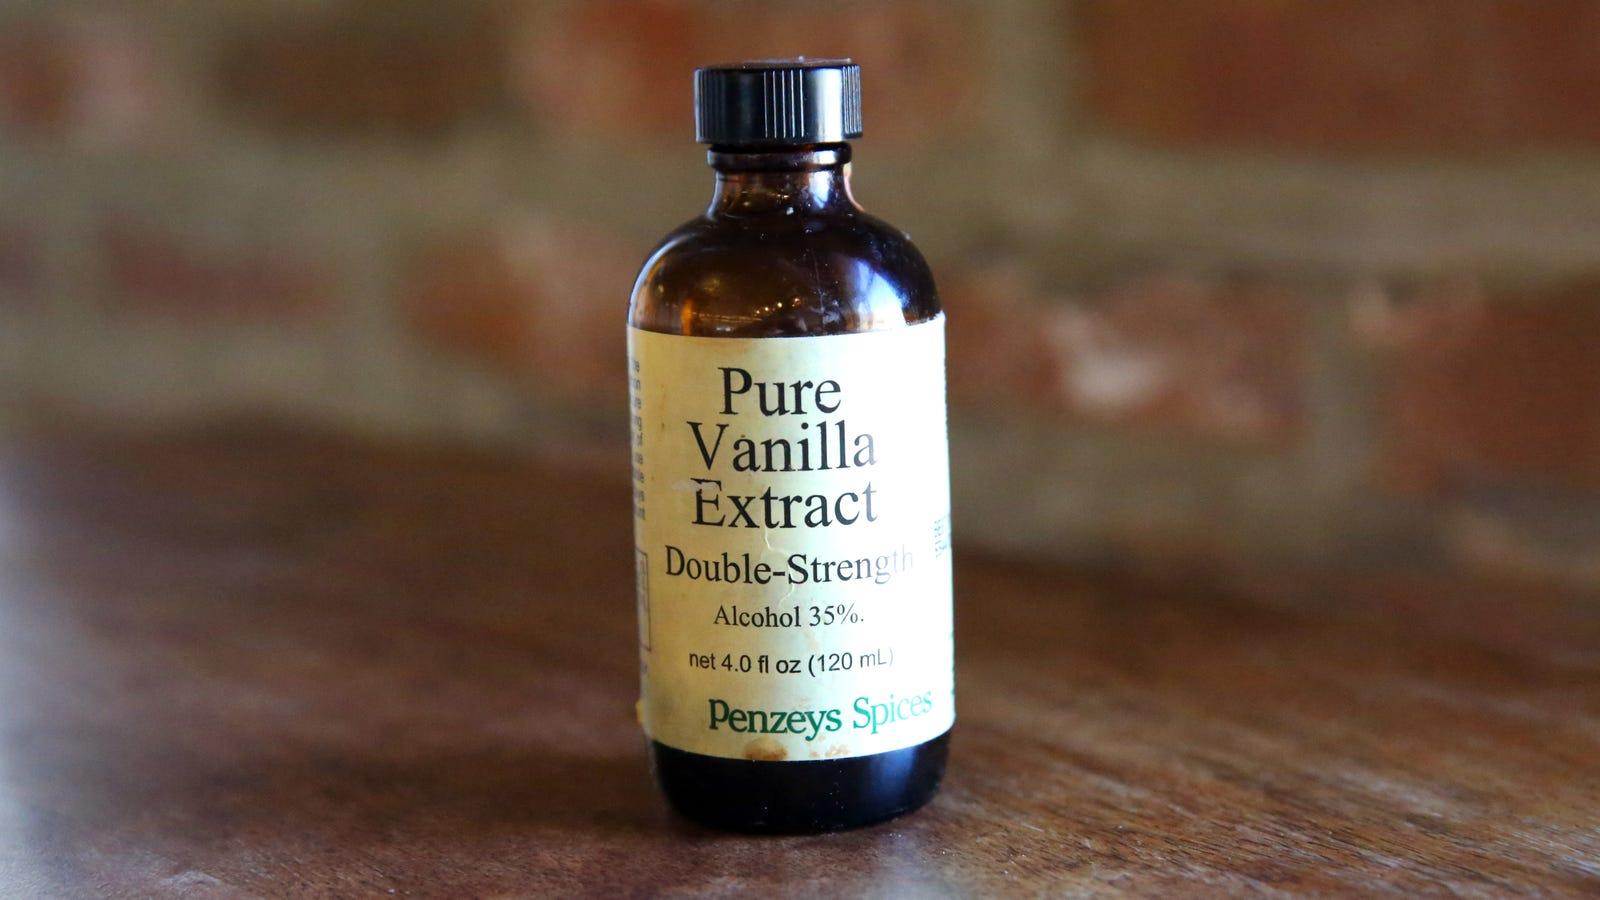 Penzeys' double-strength vanilla will make your holiday